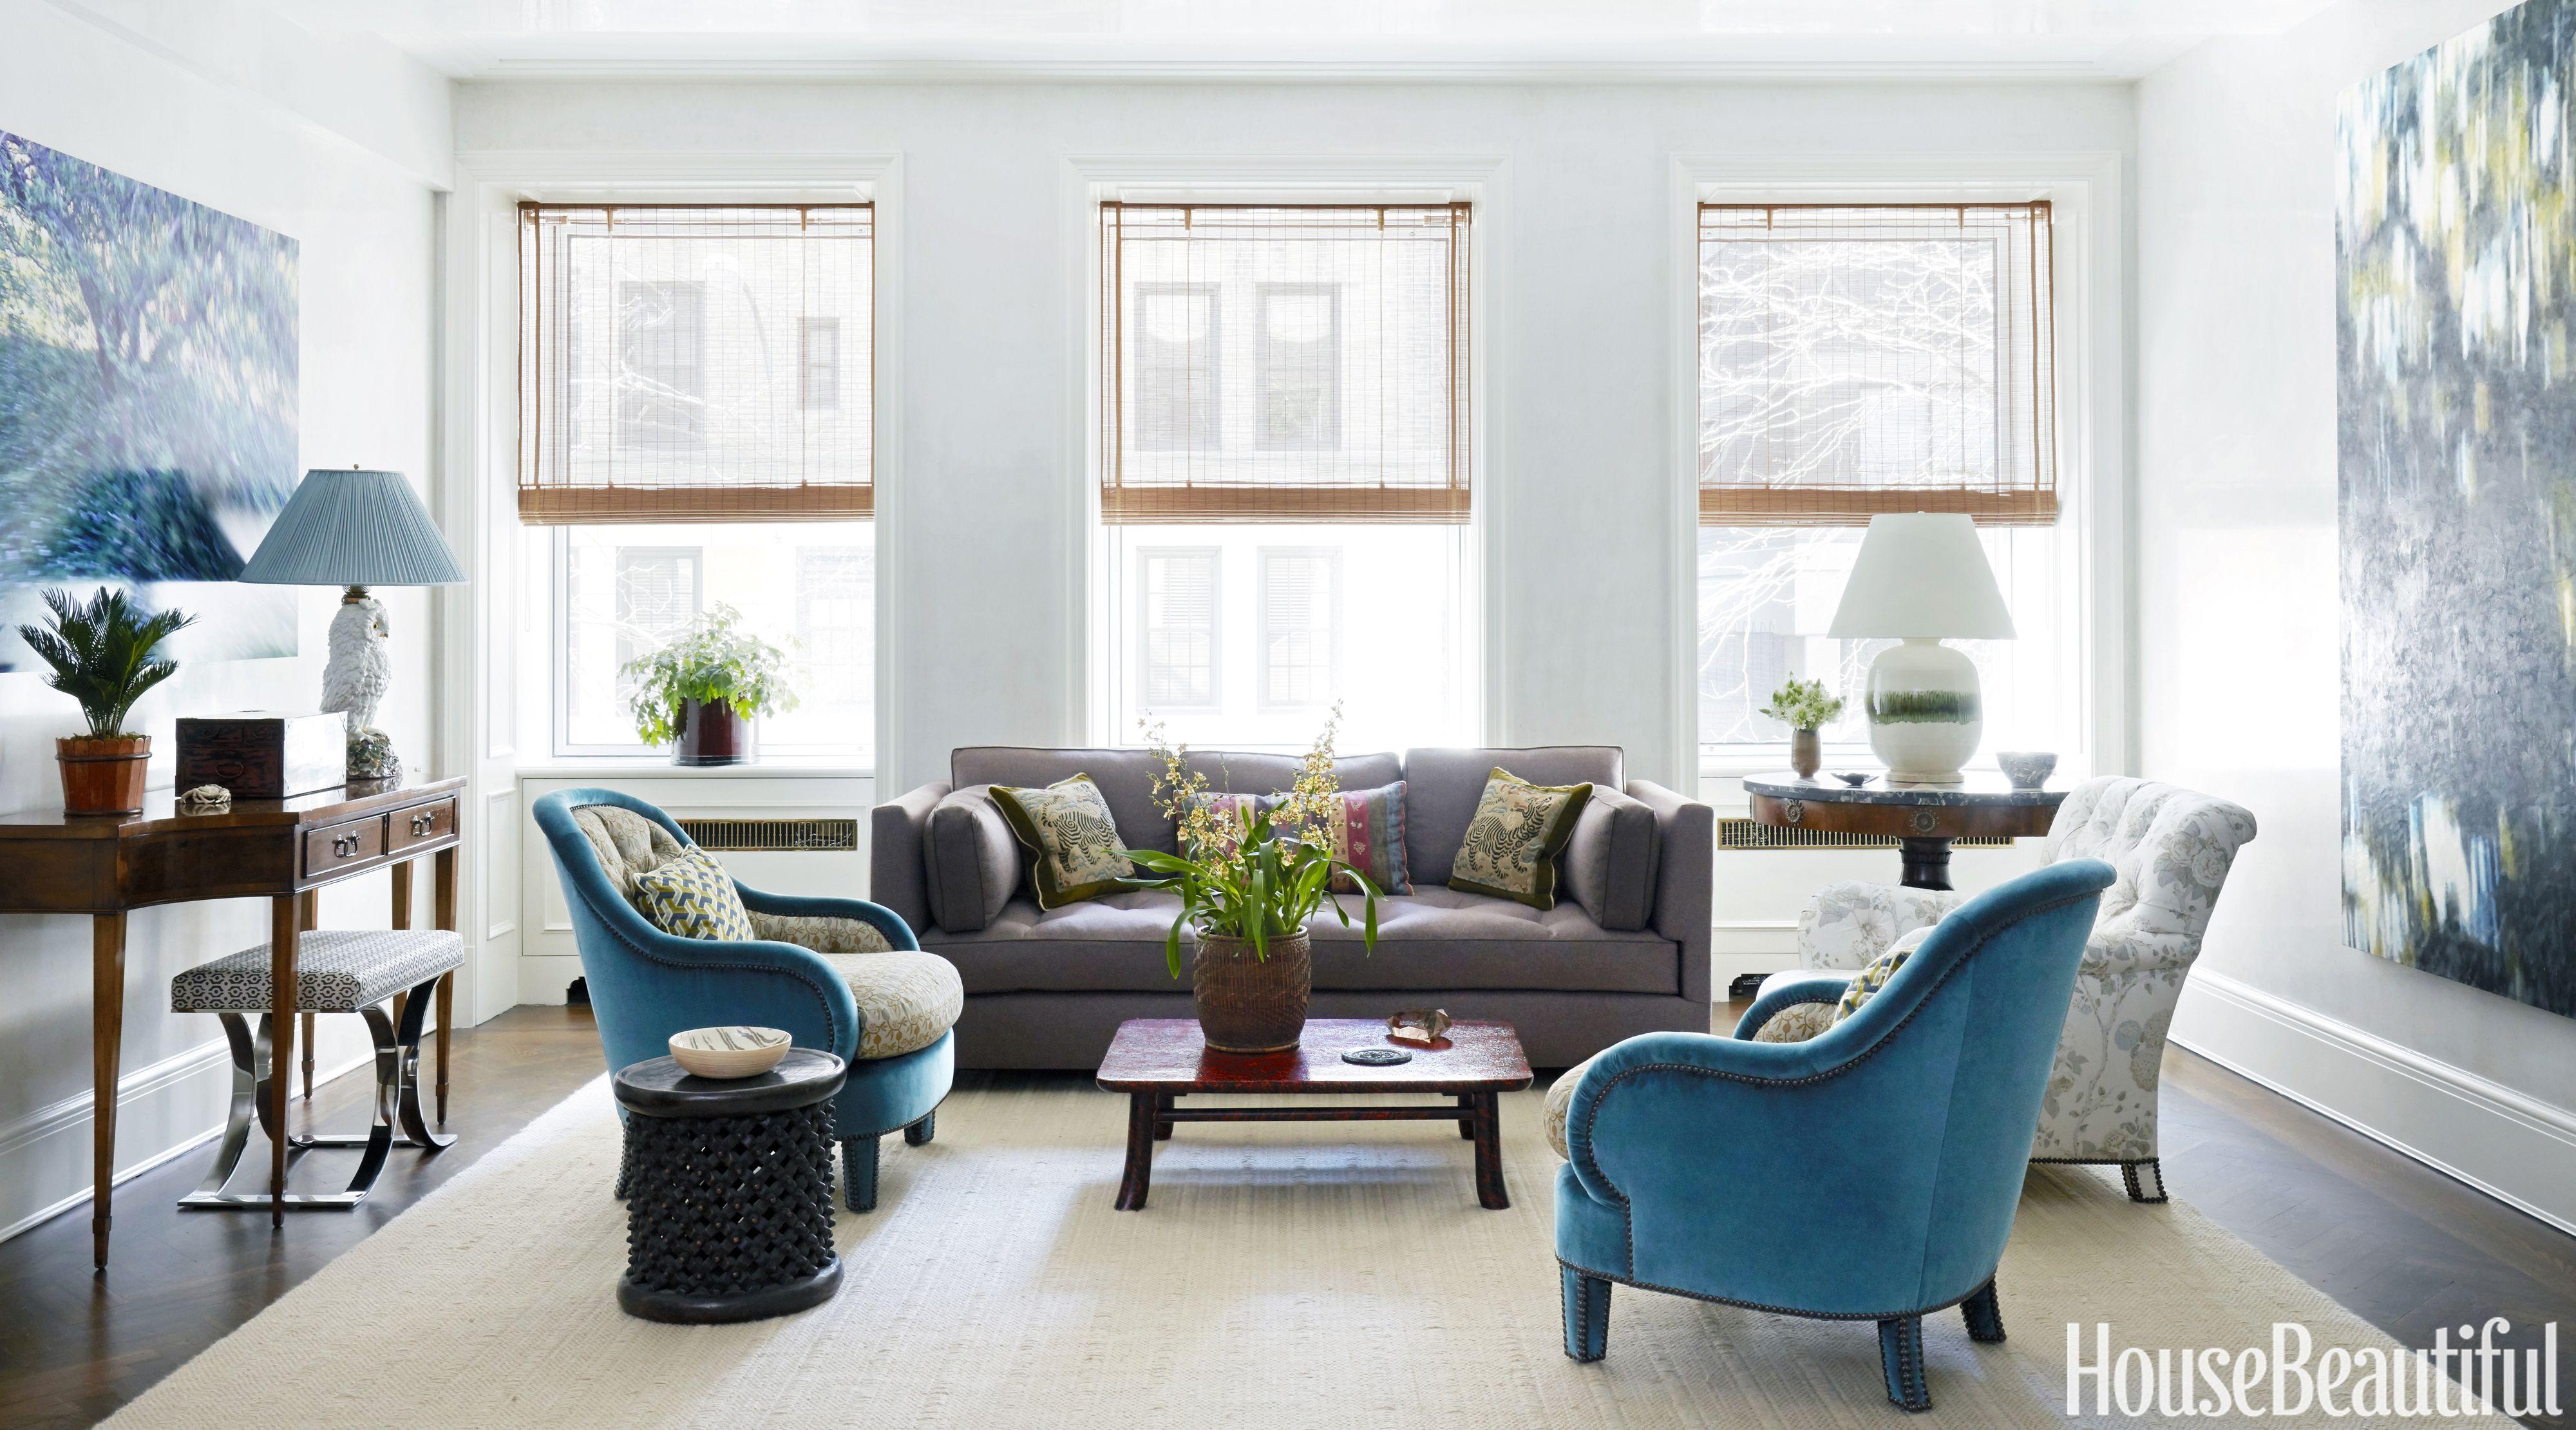 Markham Roberts Designs a Chic Manhattan Apartment - Stylish and ...